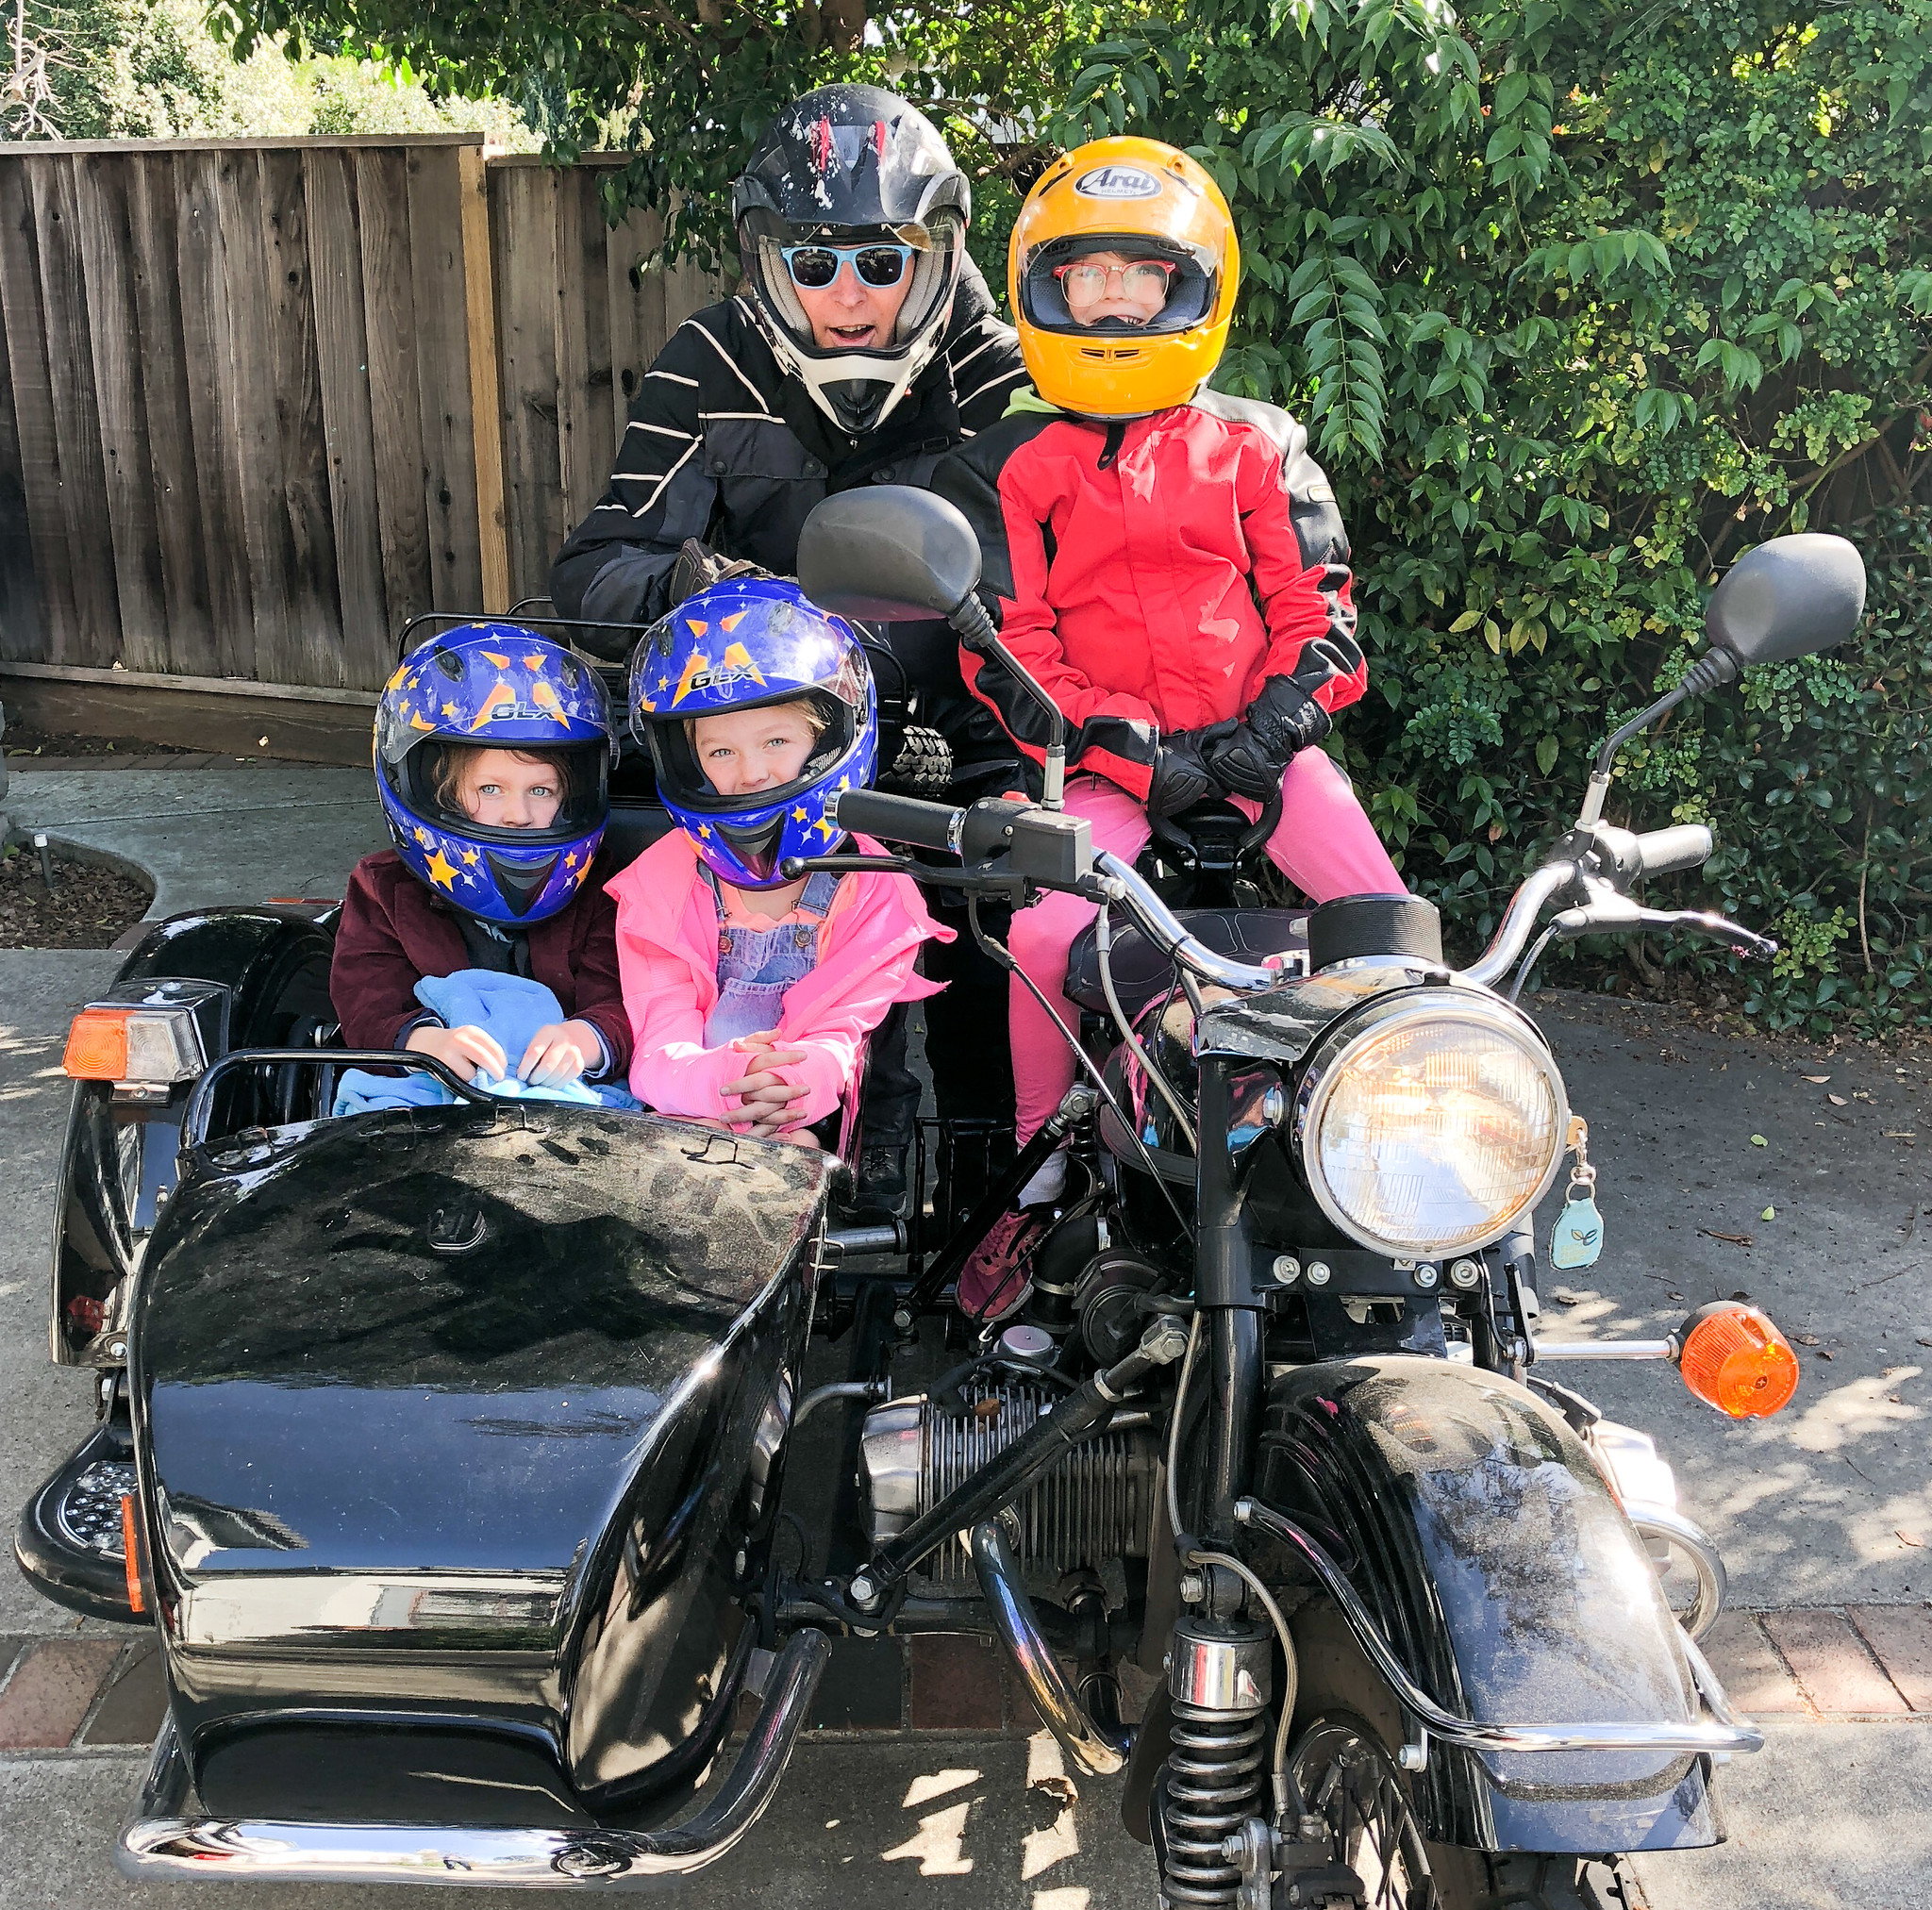 Chris-MacAskill-Baldy-ADV-Forum-Adventure-Rider-Radio-Motorcycle-Podcast-1.jpg